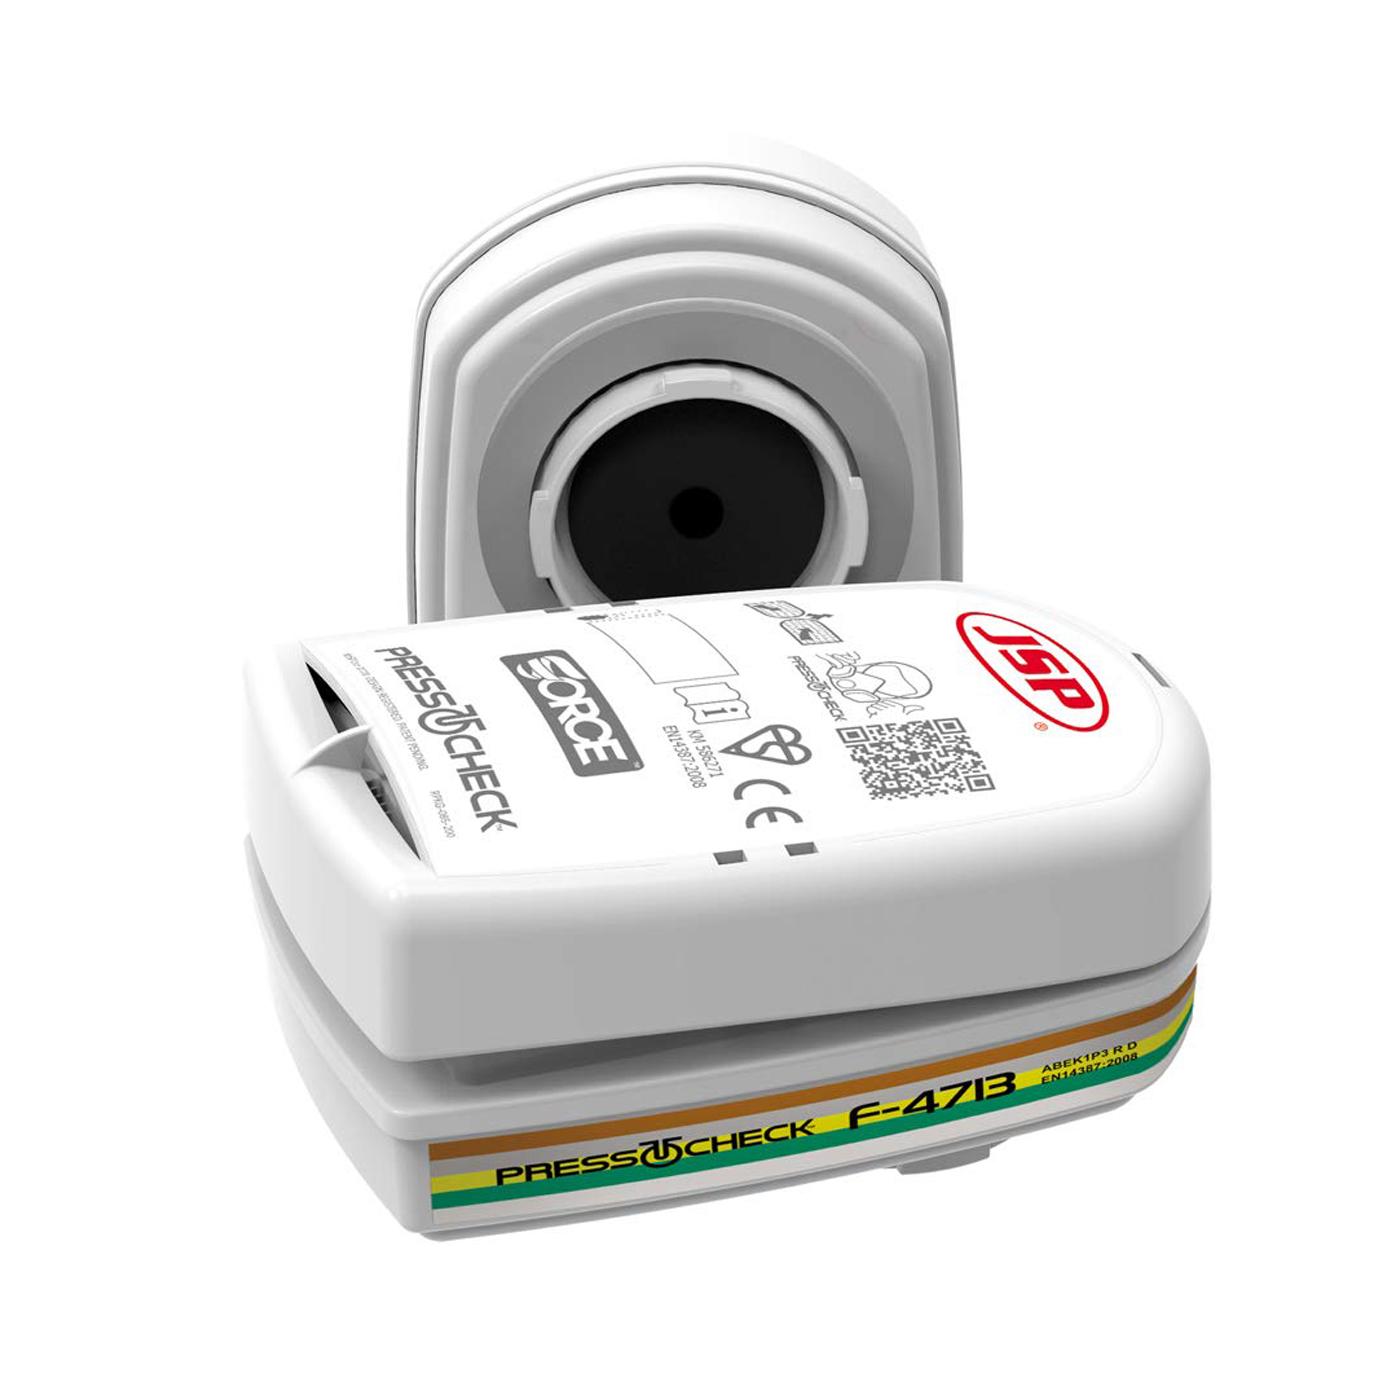 Filtropochłaniacz JSP PressToCheck Filtr – ABEK1P3 BMN750-000-600